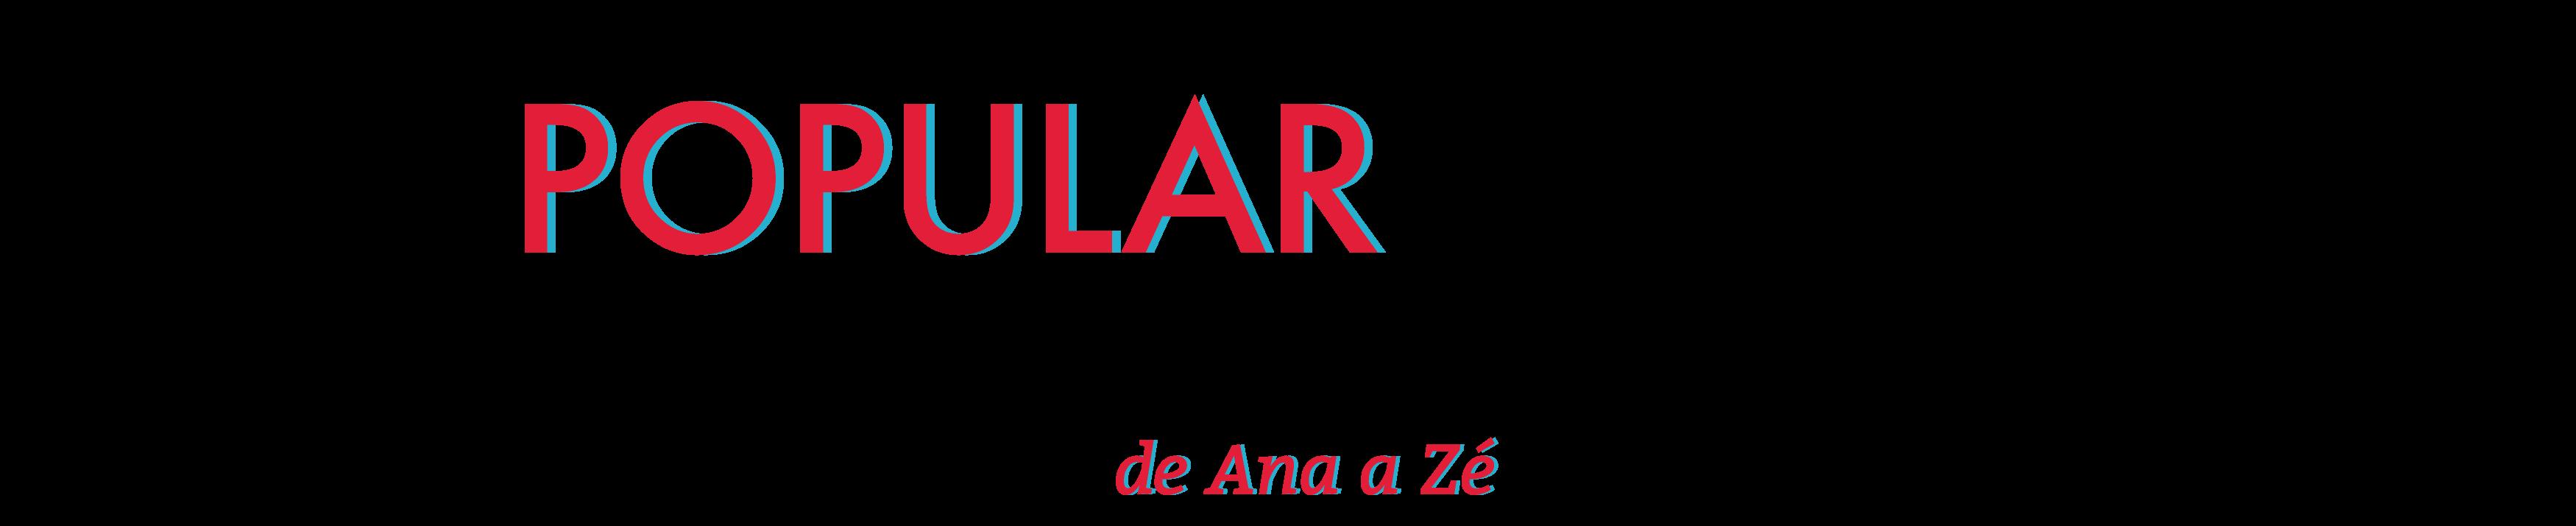 Arte Popular Portuguesa